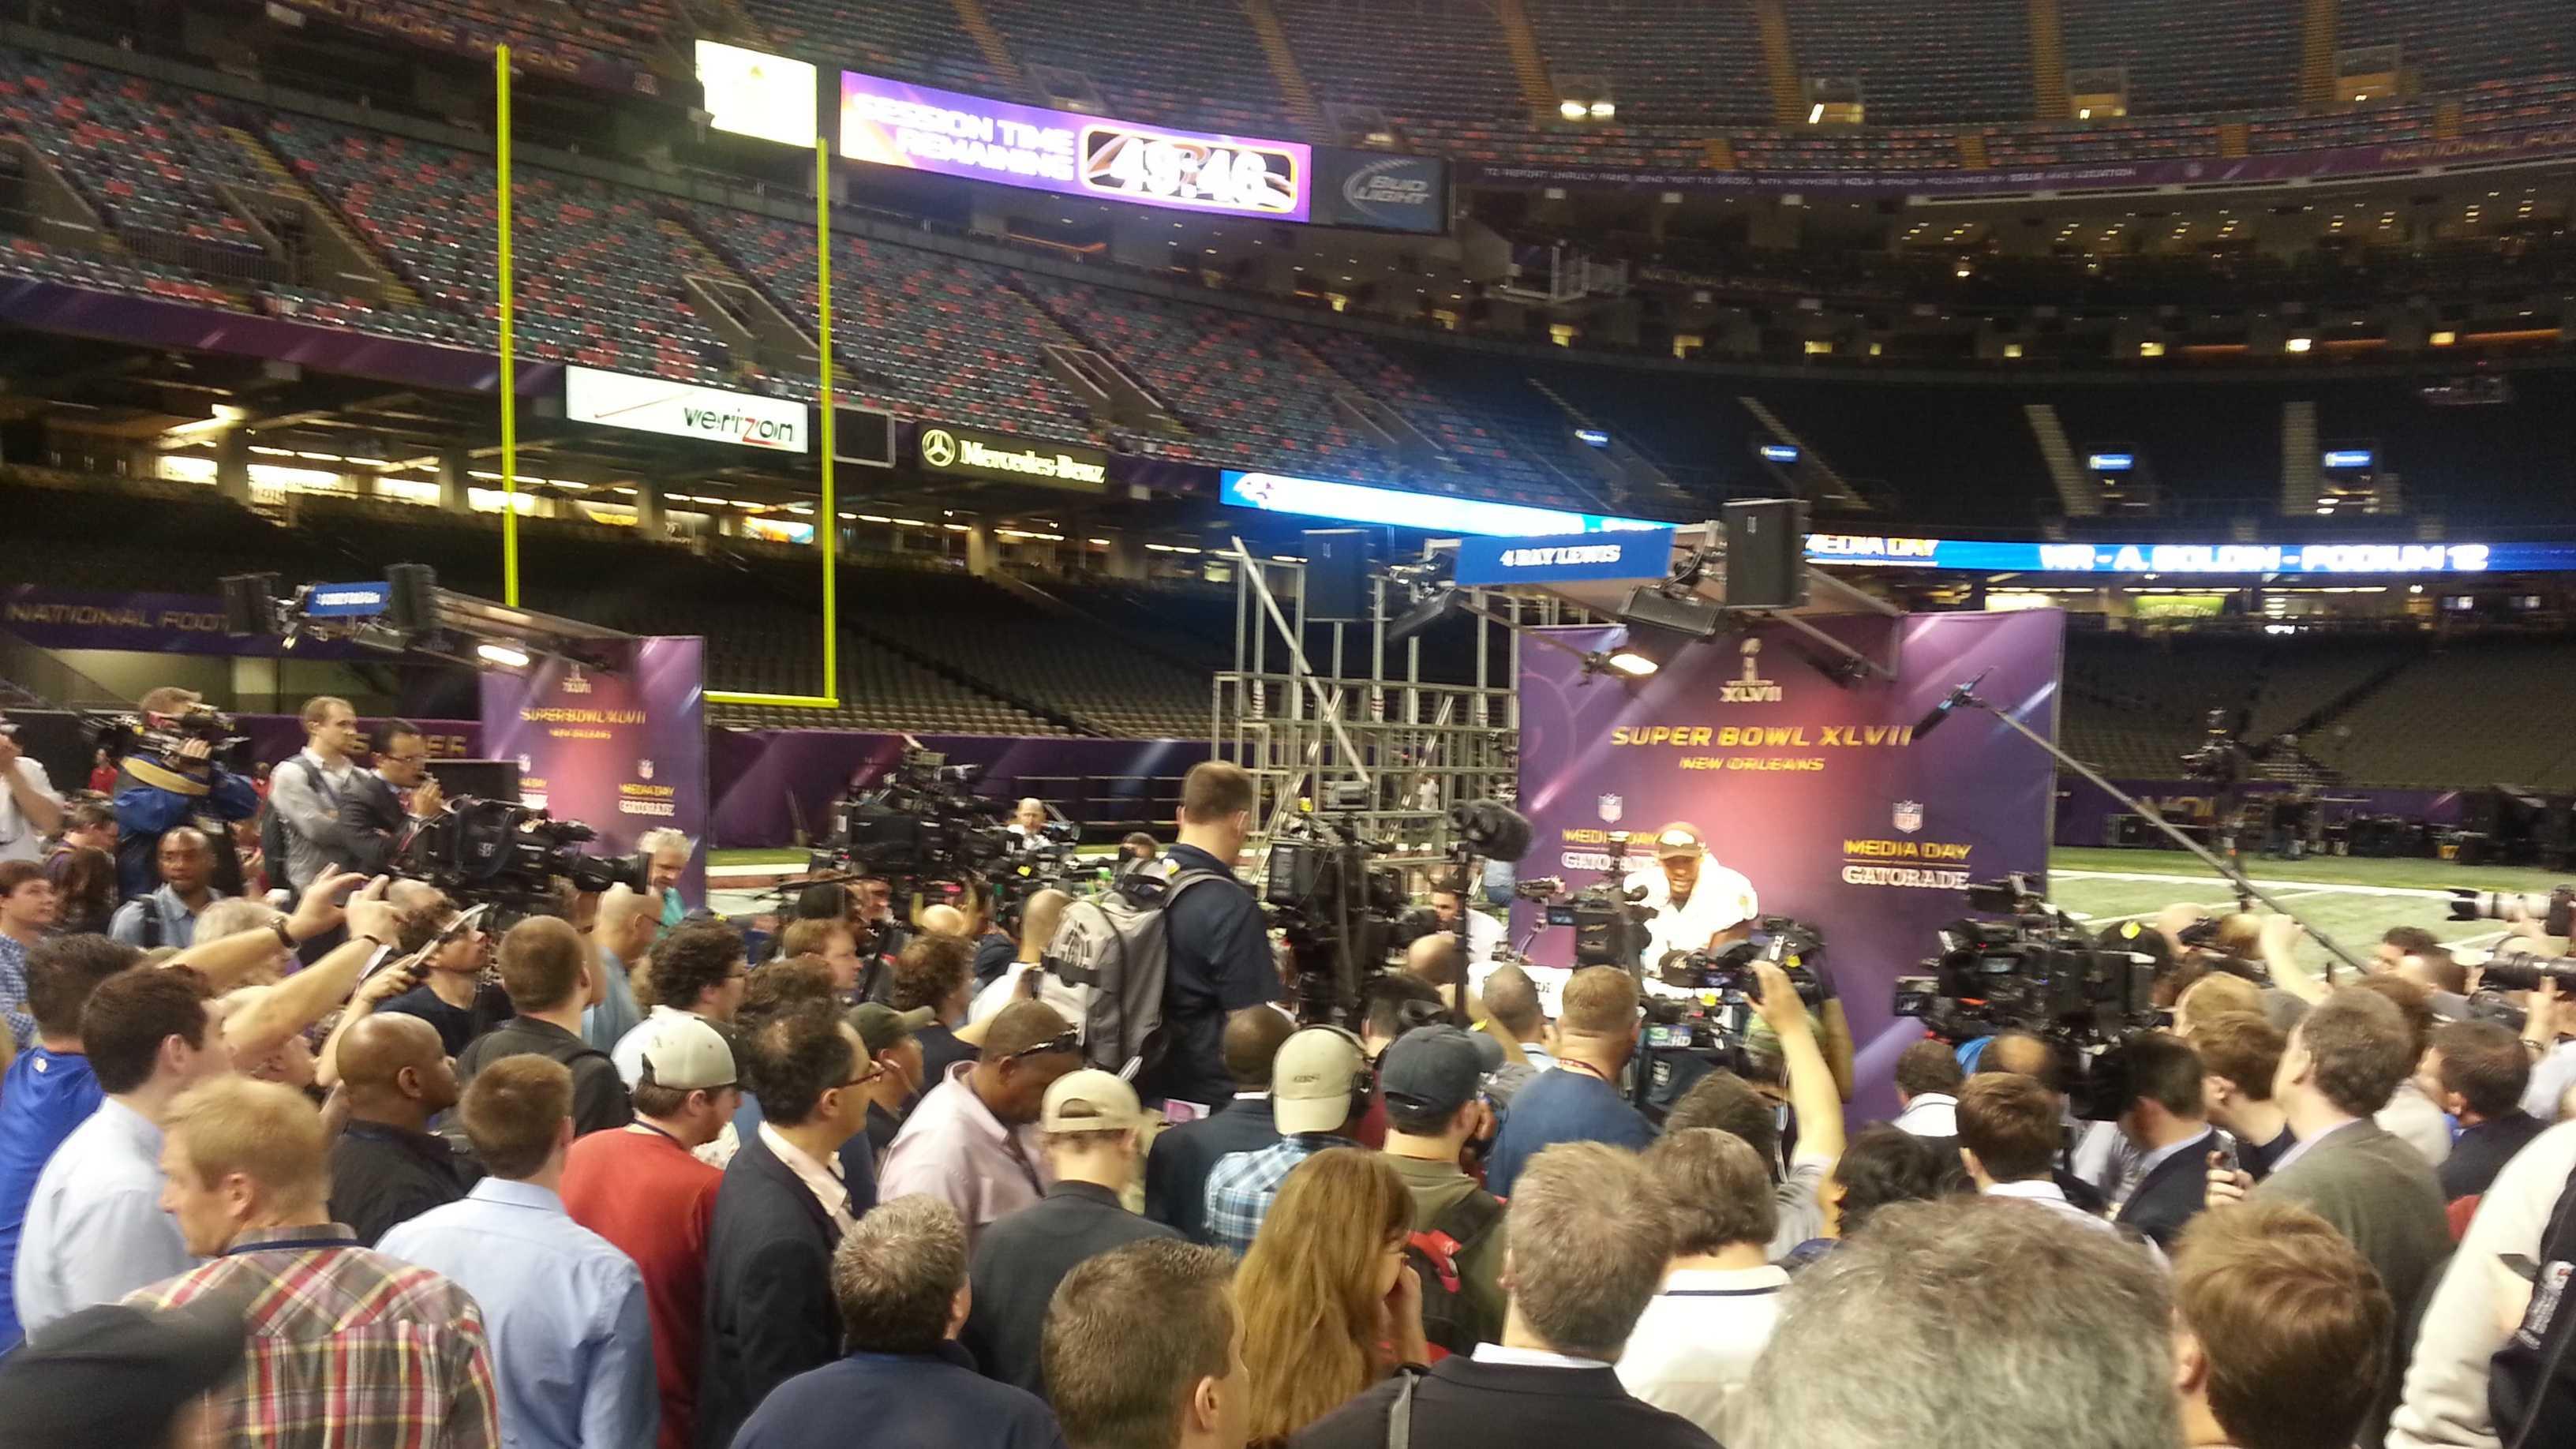 Super Bowl XLVII Media Day 1.jpg